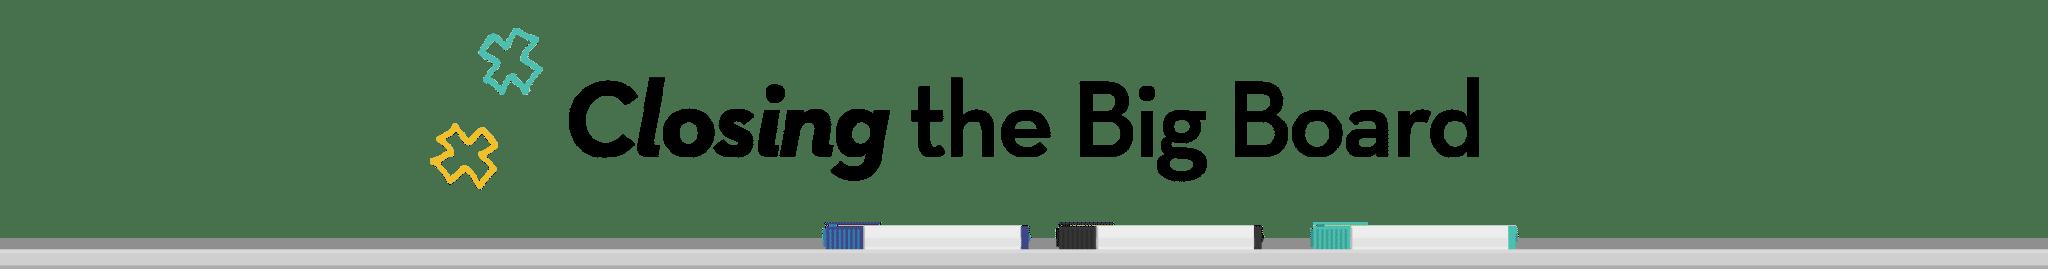 4-closing-the-big-board